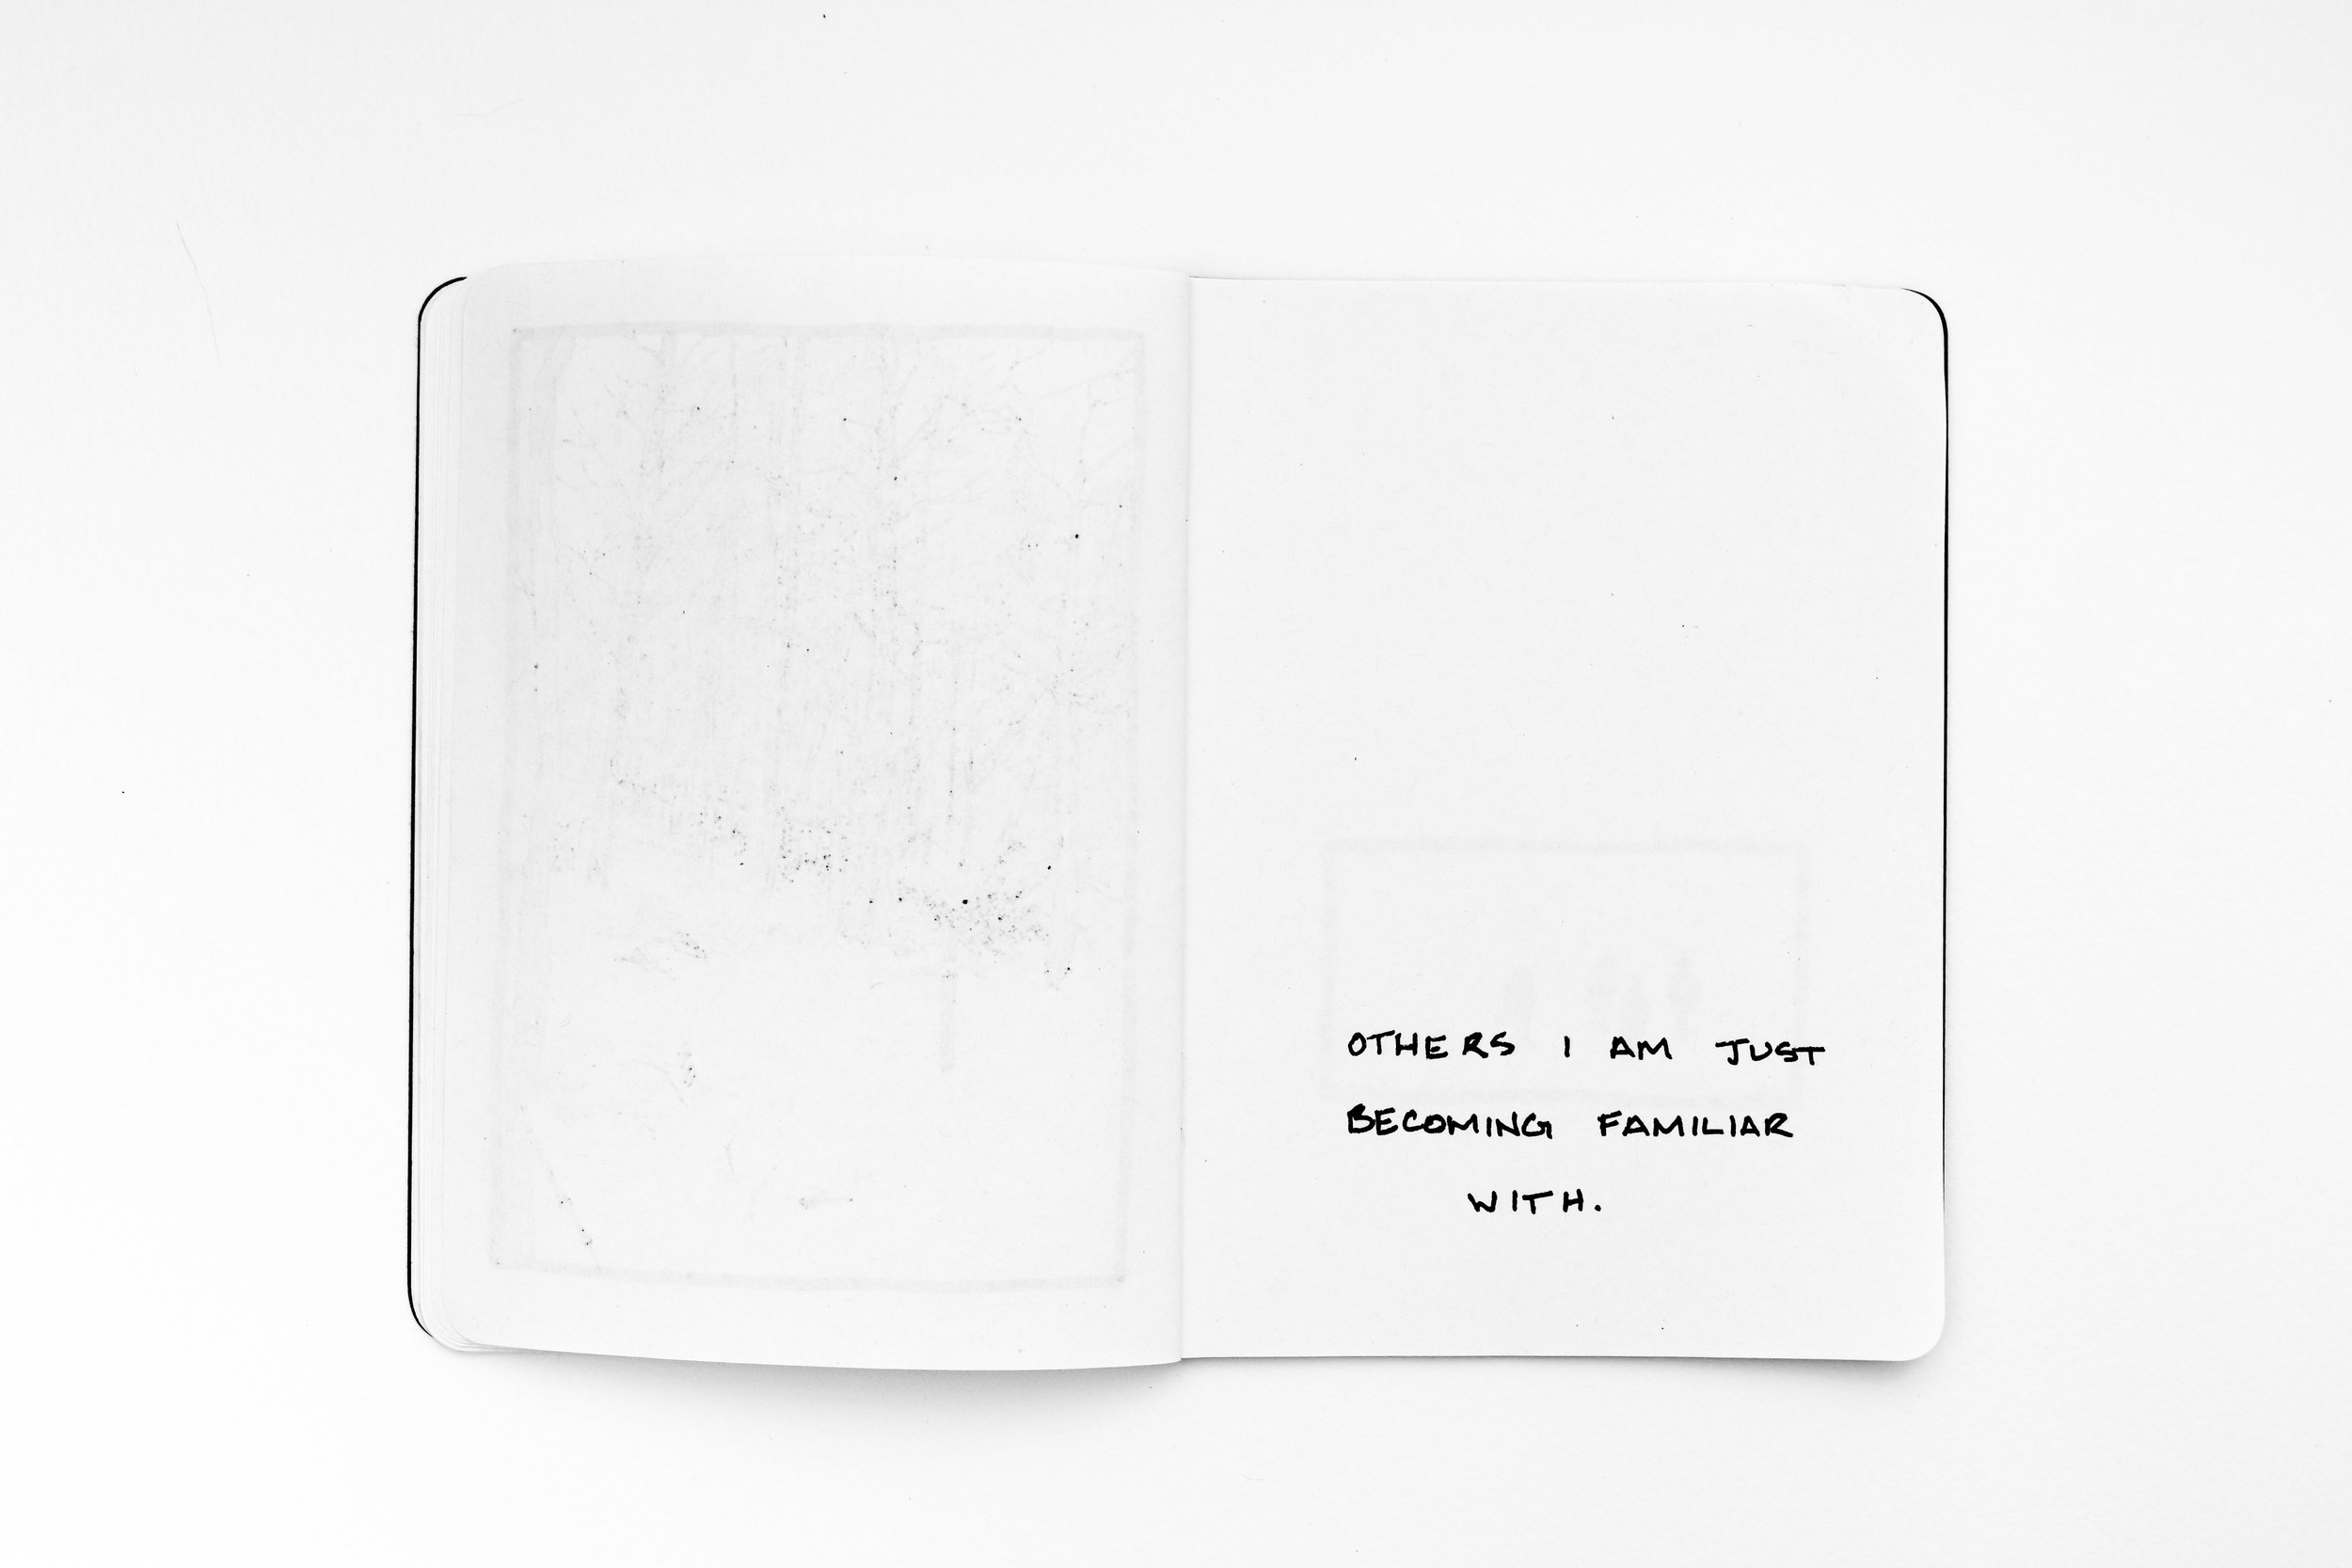 tiffany-moore-sketchbook-landscape (12 of 13)-3.jpg